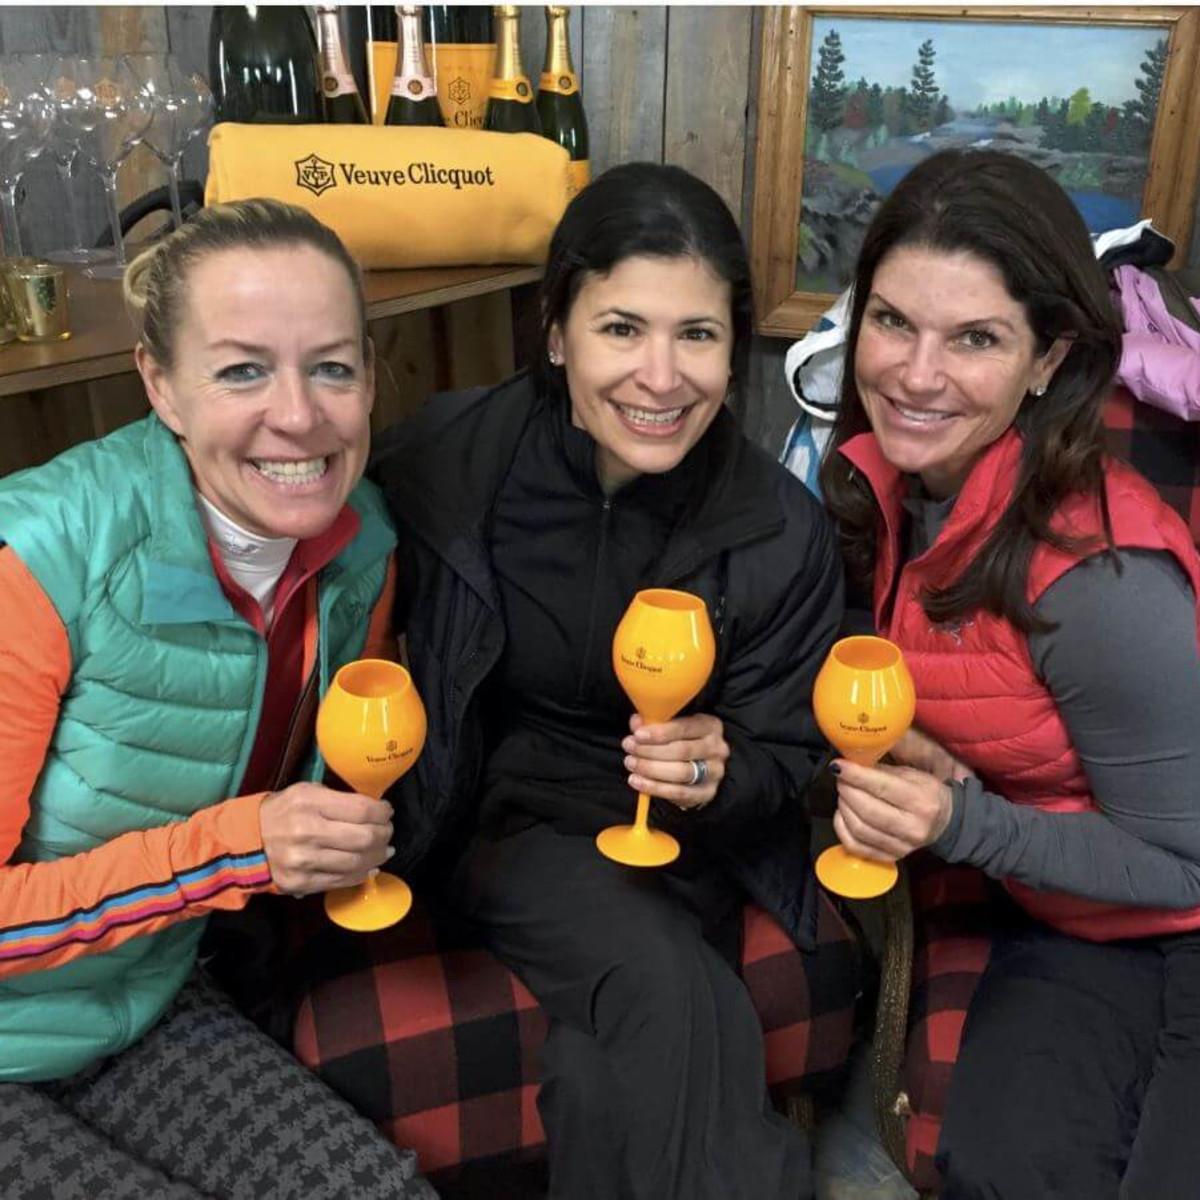 Rosemary Schatman, Kristy Bradshaw and Laura Davenport